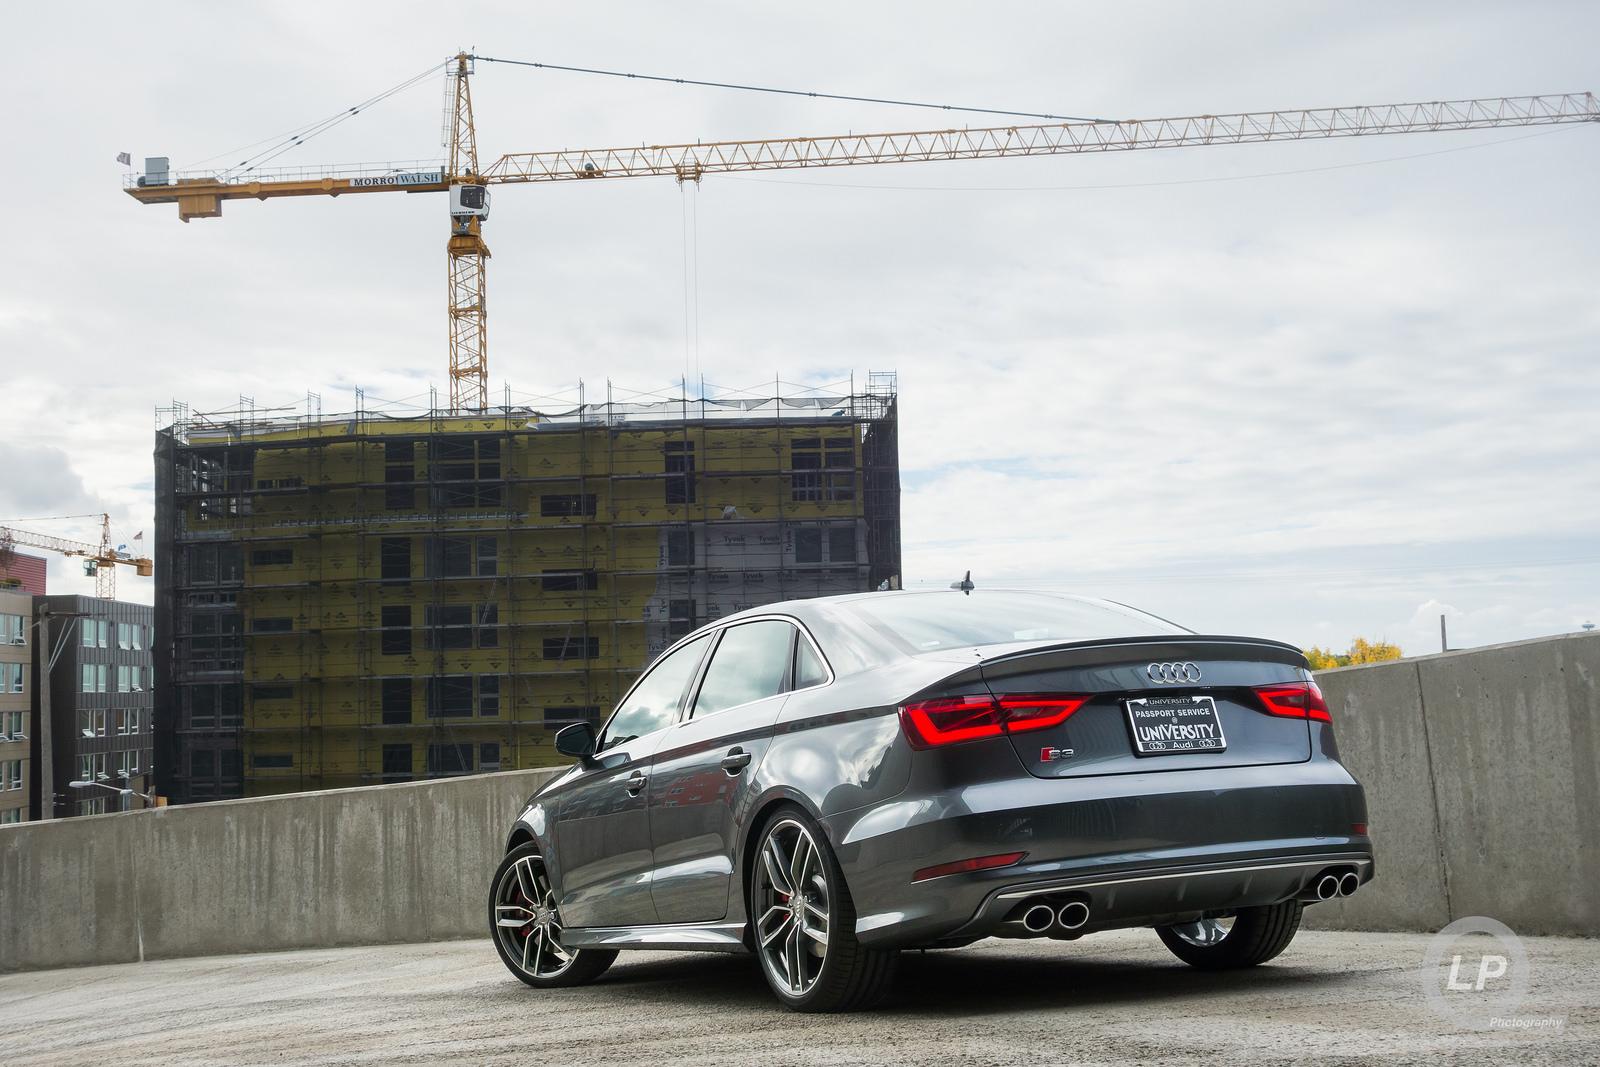 Launch Edition Daytona Gray Audi S3 at University Audi